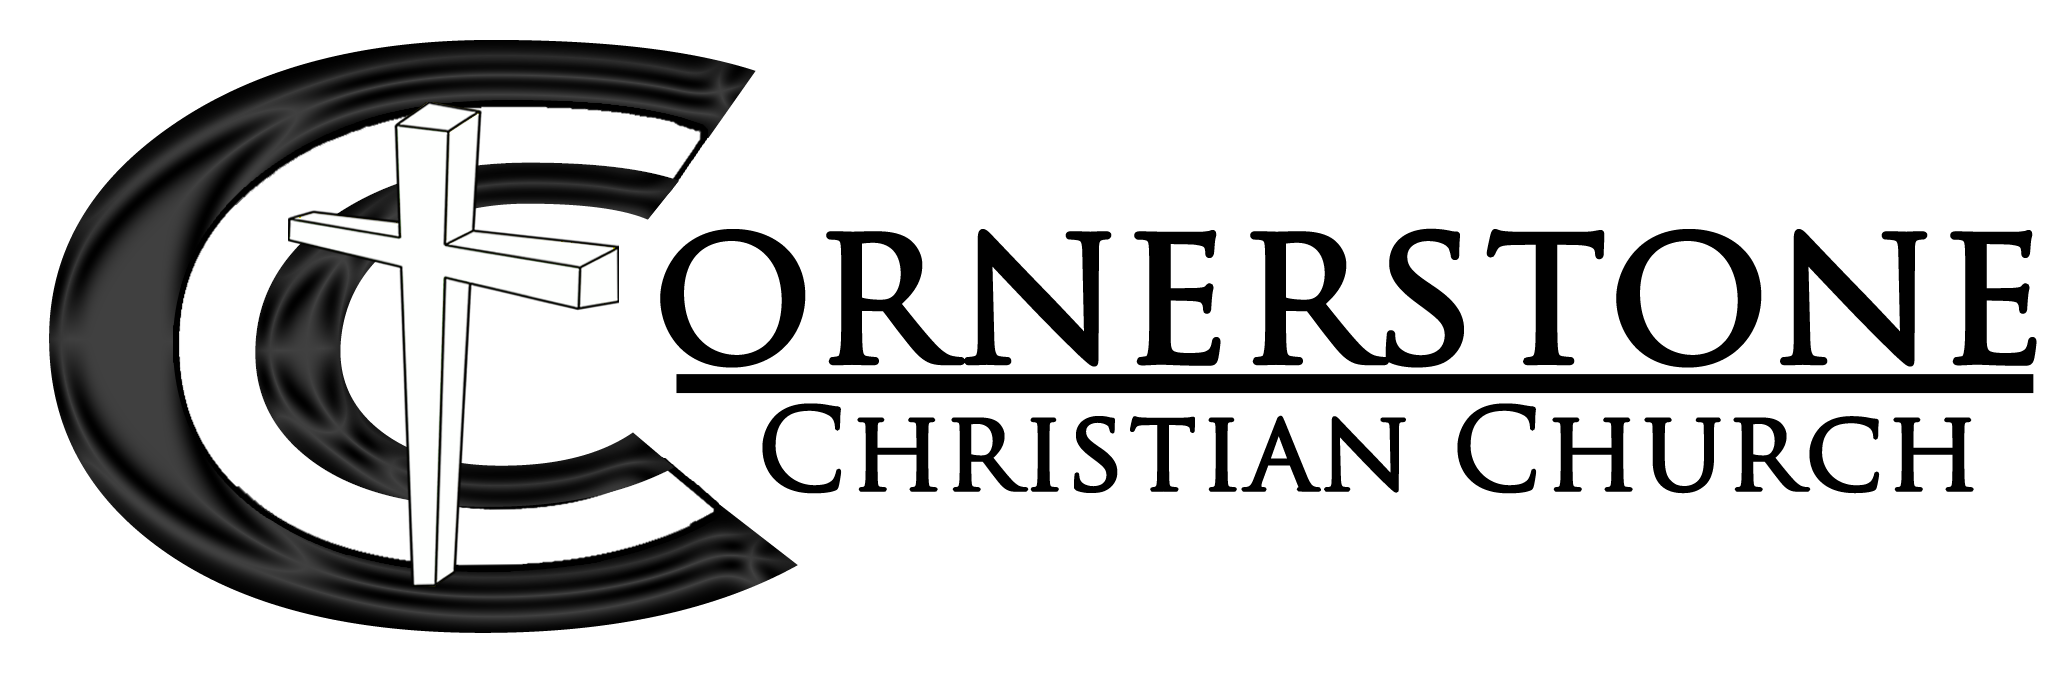 Cornerstone Logo 2018 Monochrome